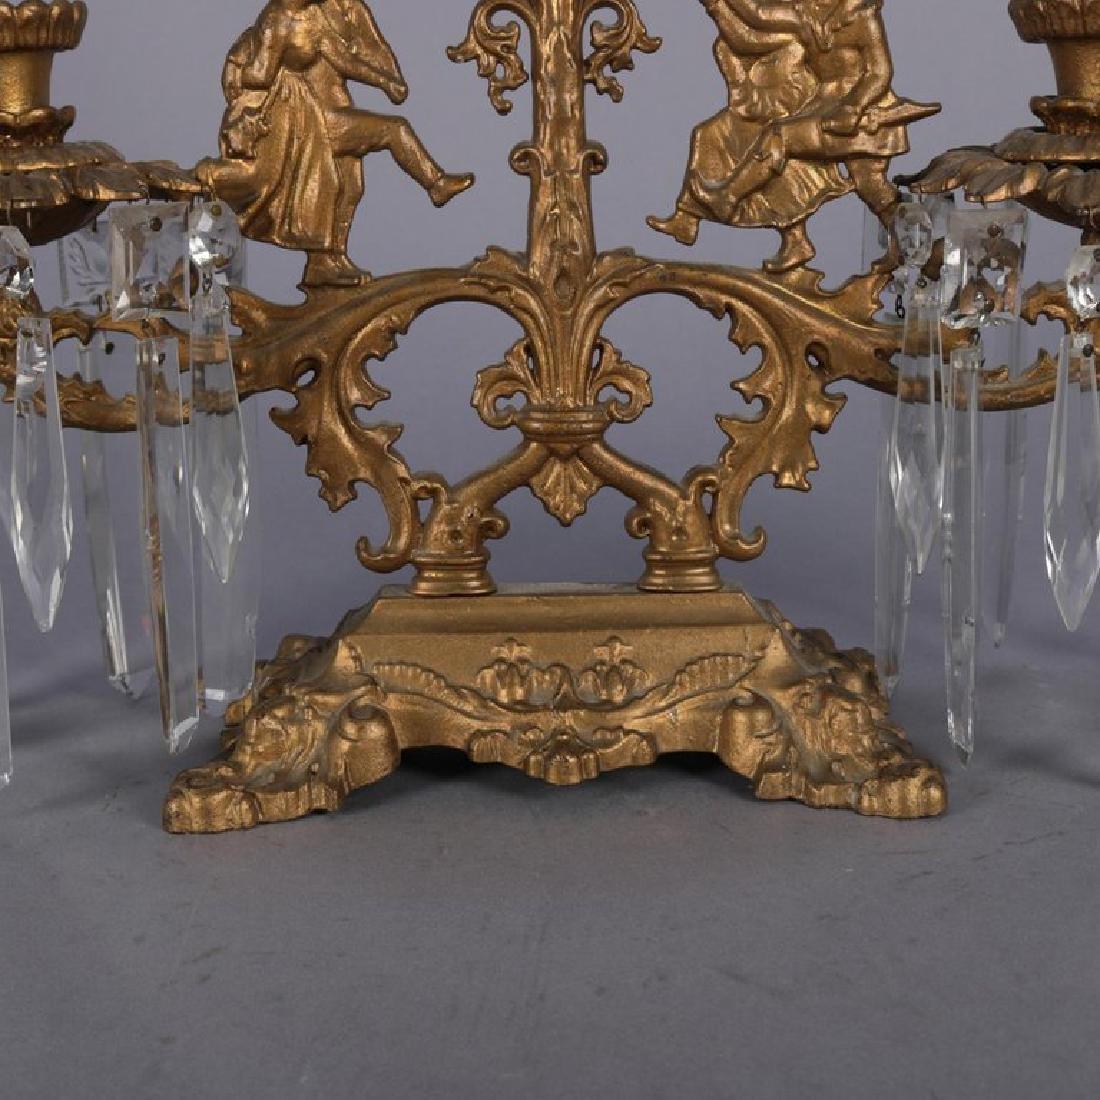 Antique French Gilt Metal & Crystal Figural Girandole - 4